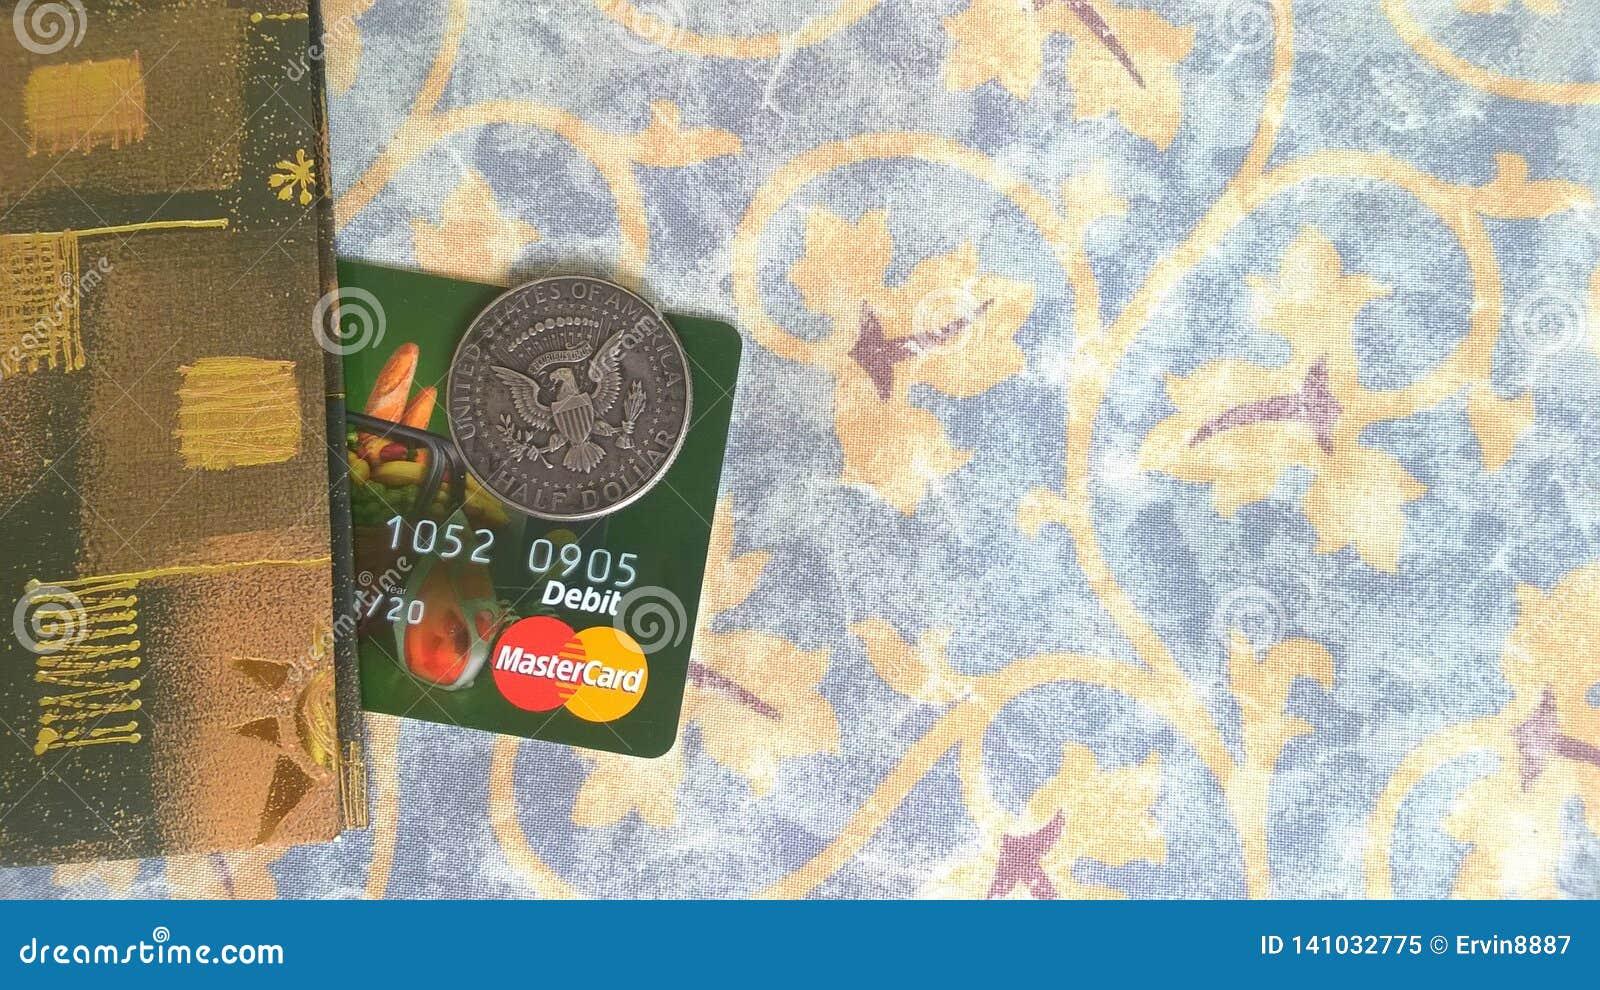 Карта банка Mastercard и монетка полдоллара